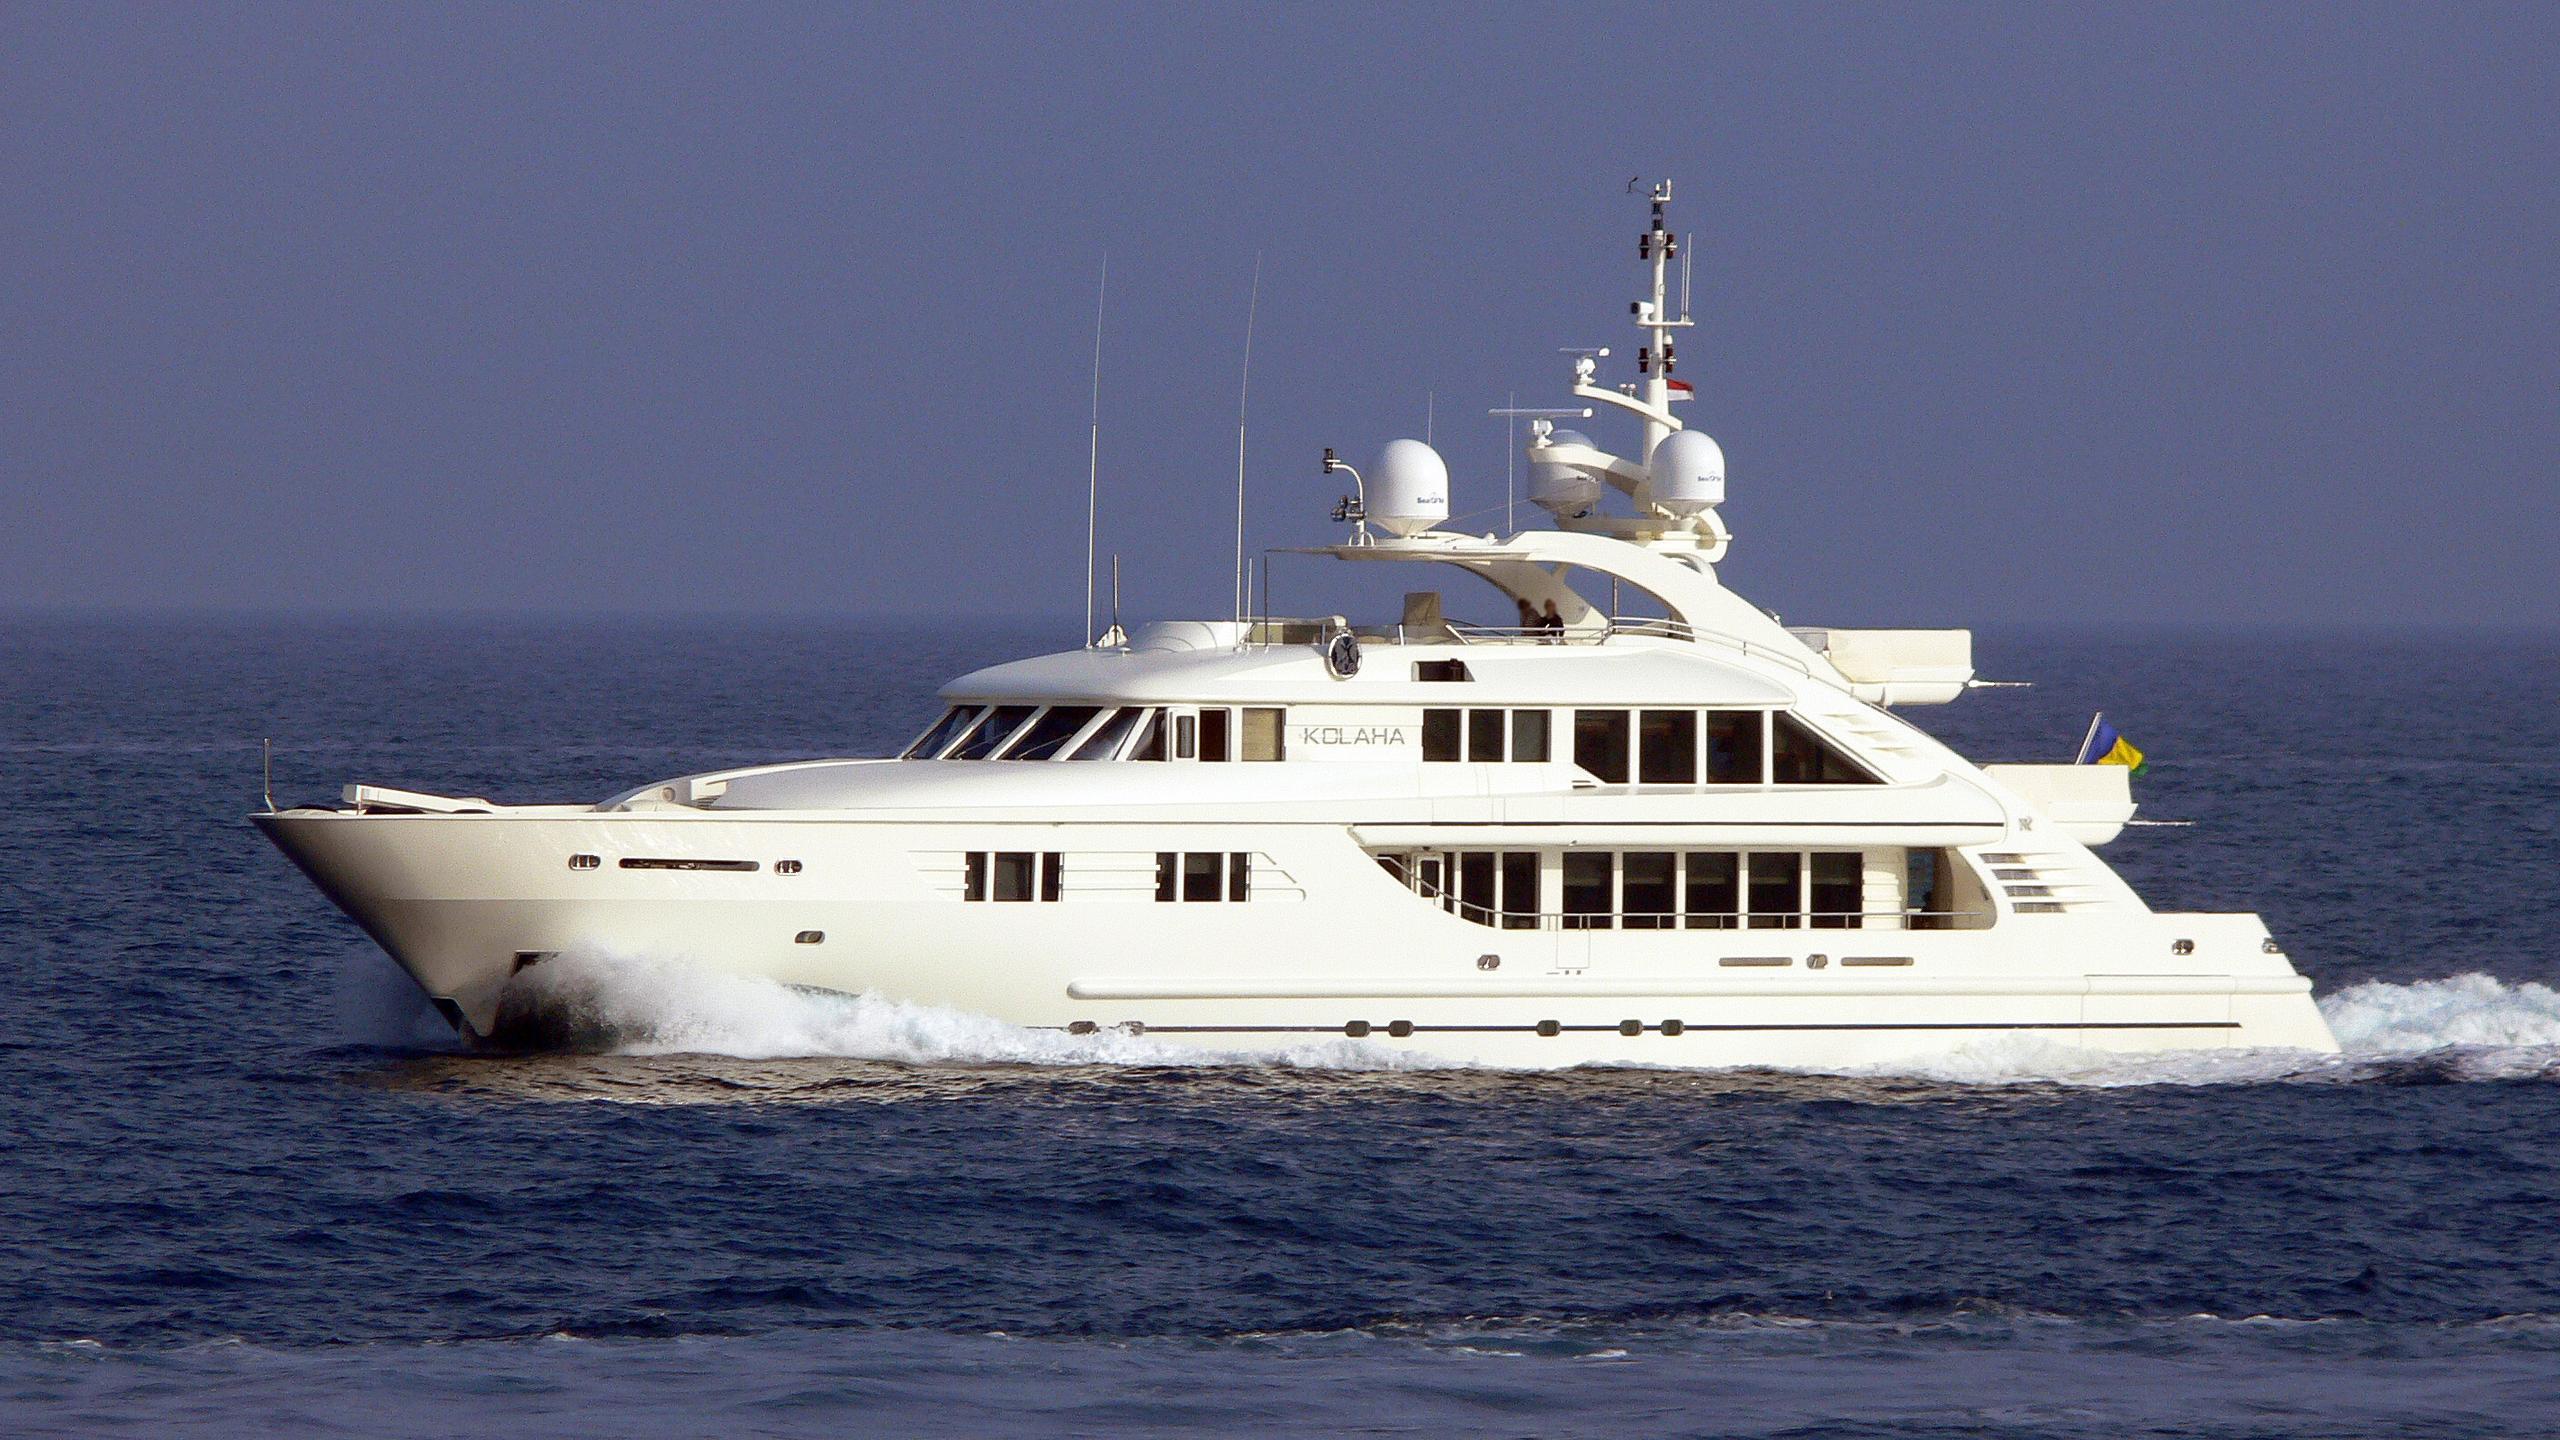 rola-motor-yacht-isa-470-2005-47m-cruising